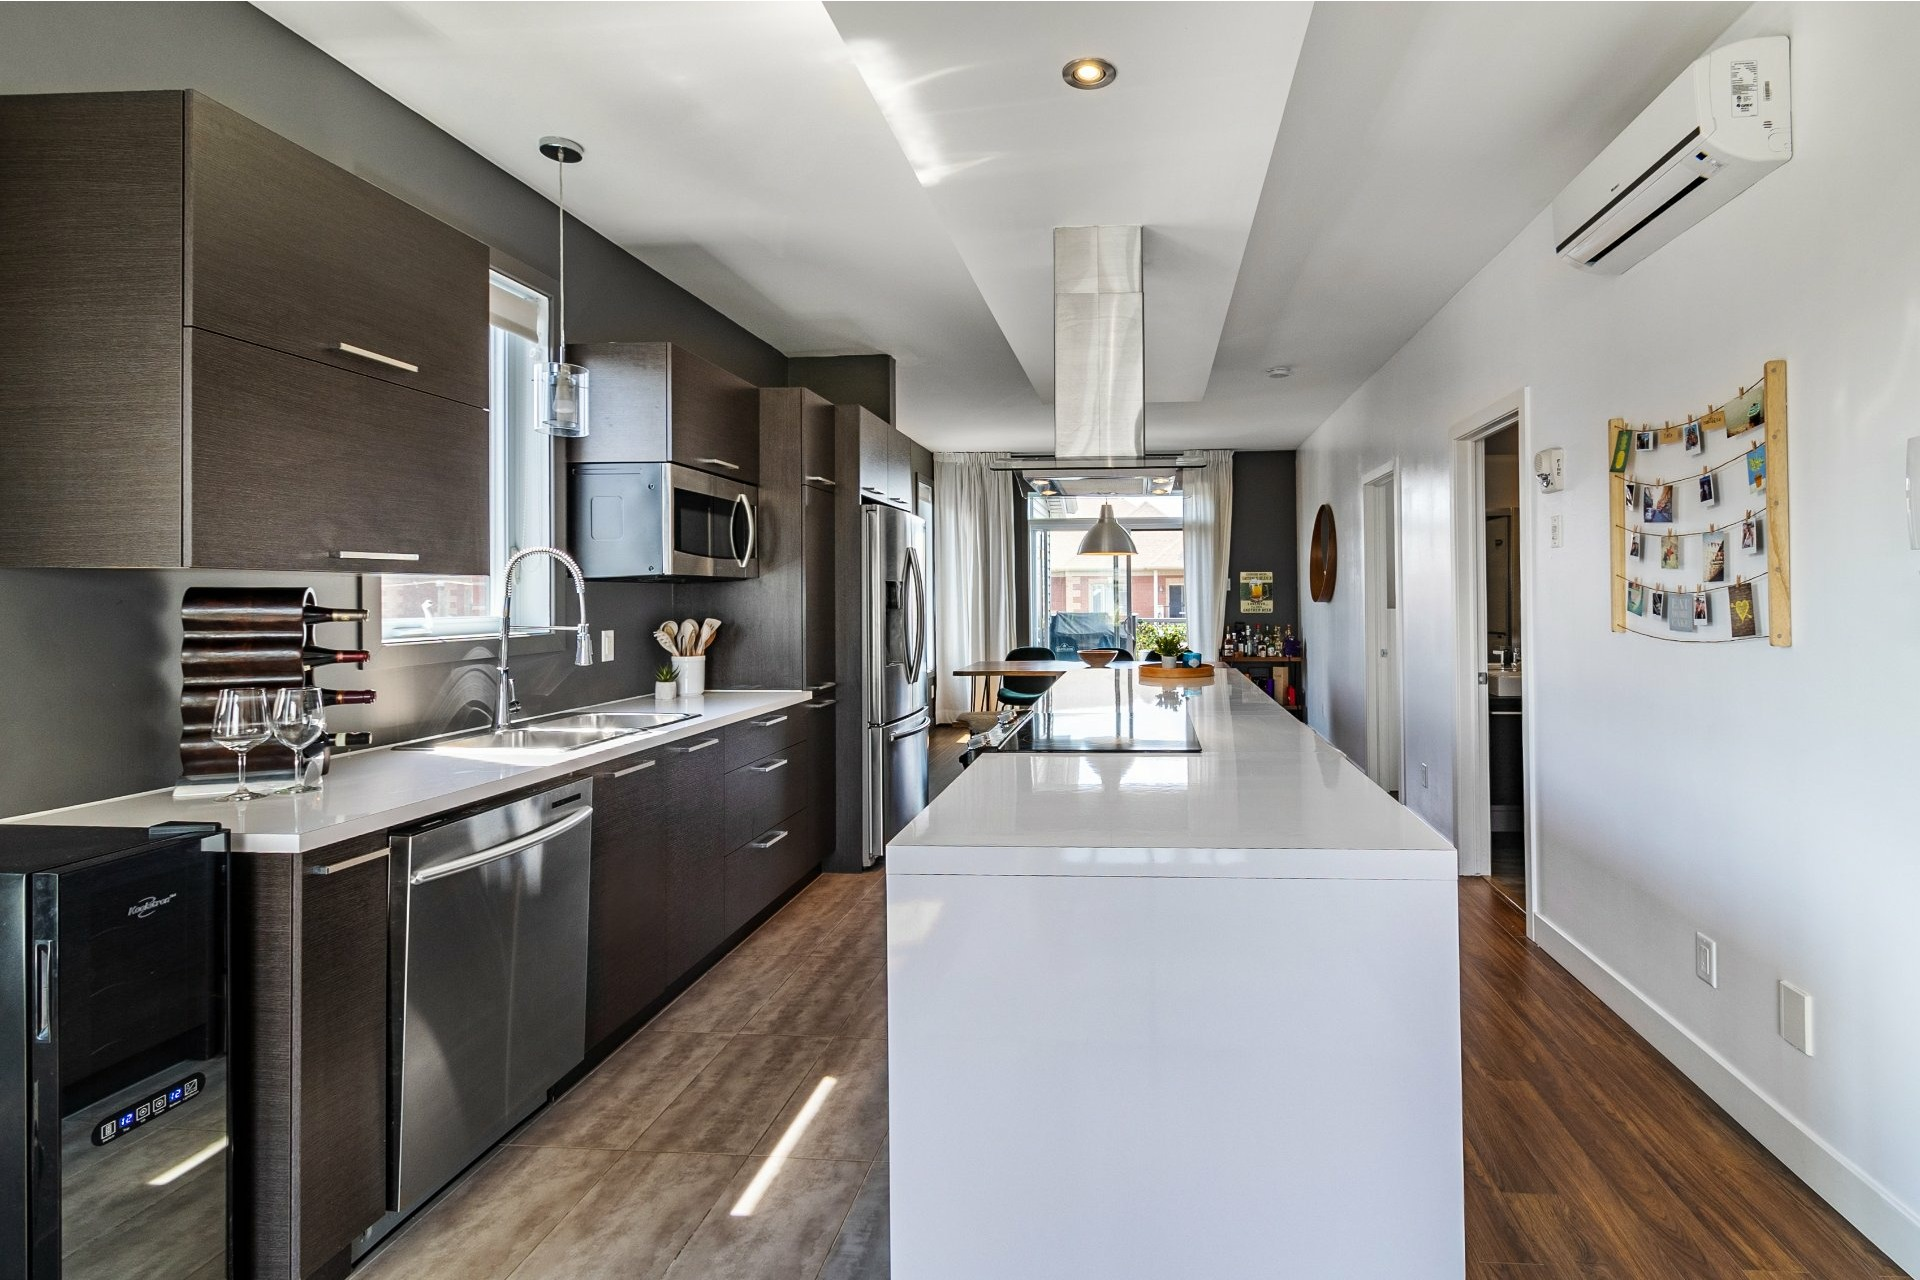 image 10 - Apartment For sale Saint-Hubert Longueuil  - 7 rooms